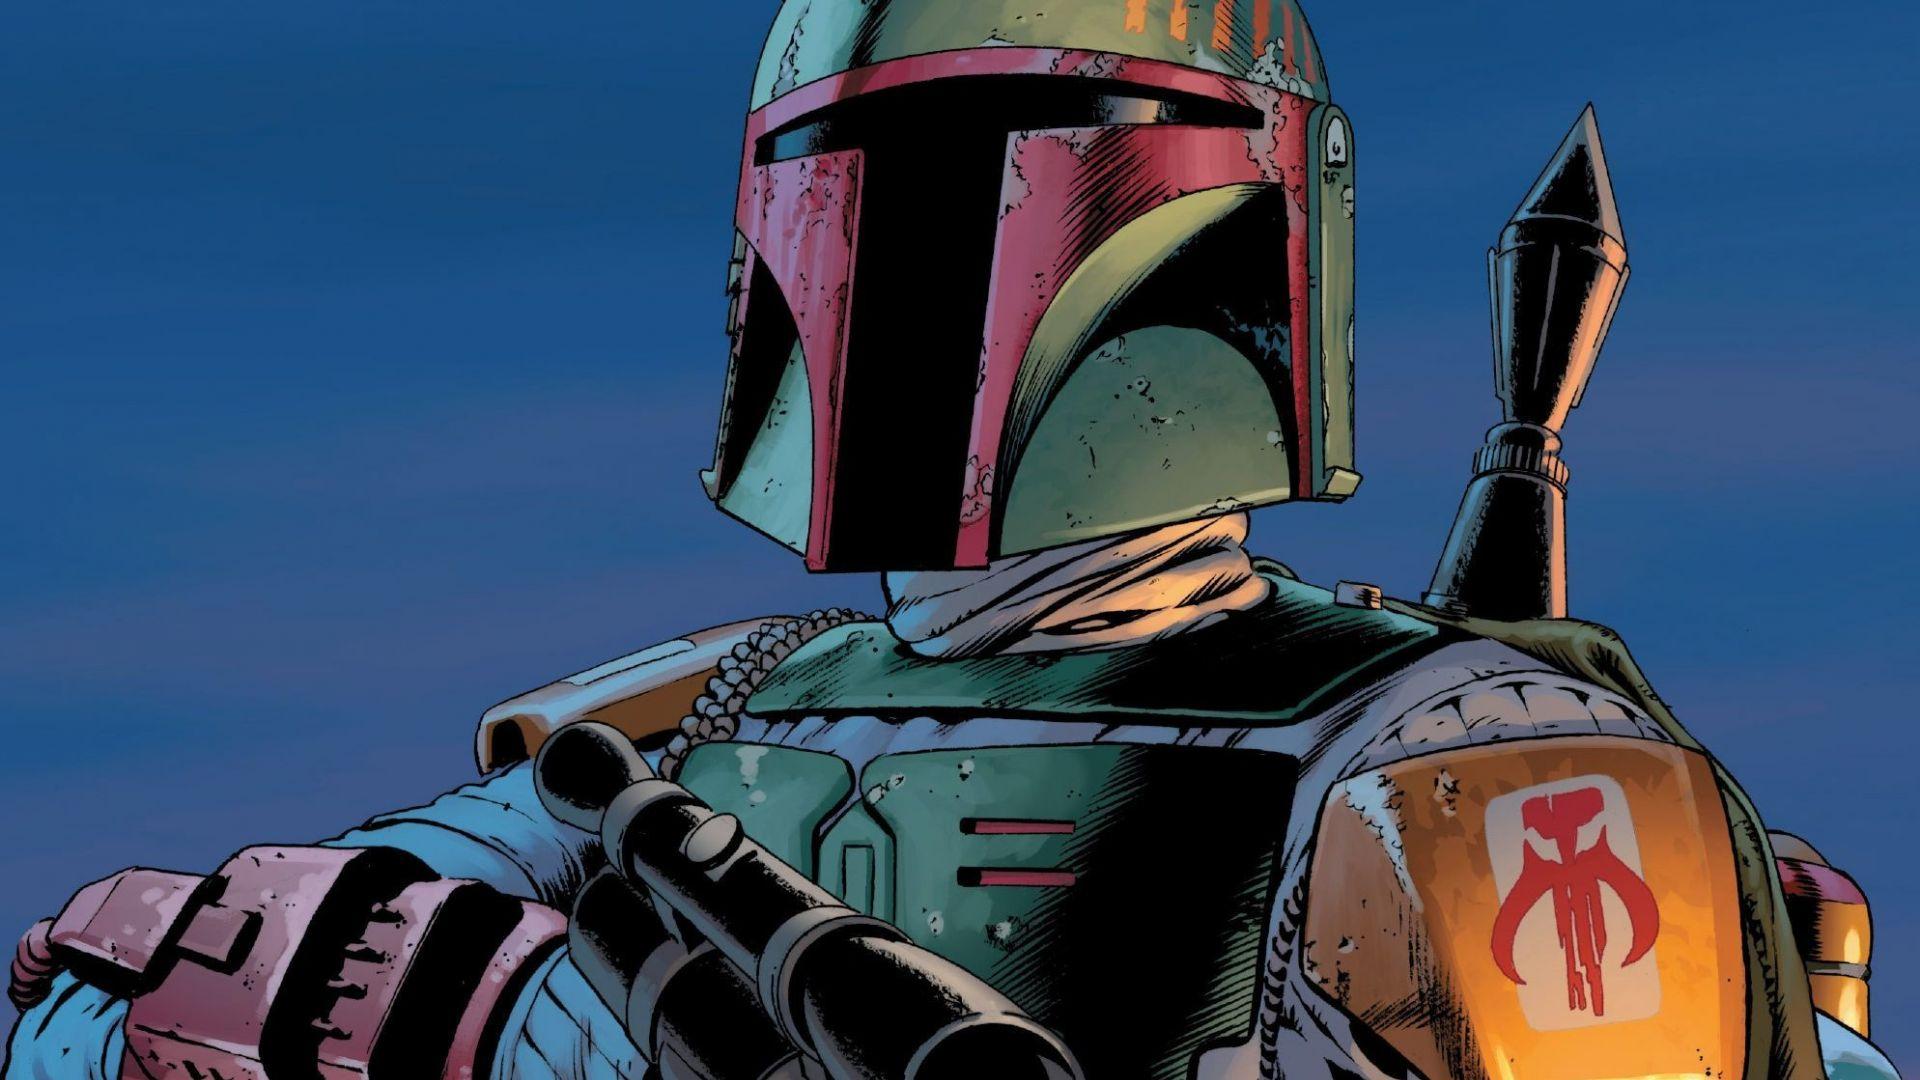 Desktop Wallpaper Boba Fett Star Wars Comics Soldier Hd Image Picture Background Eabaf8